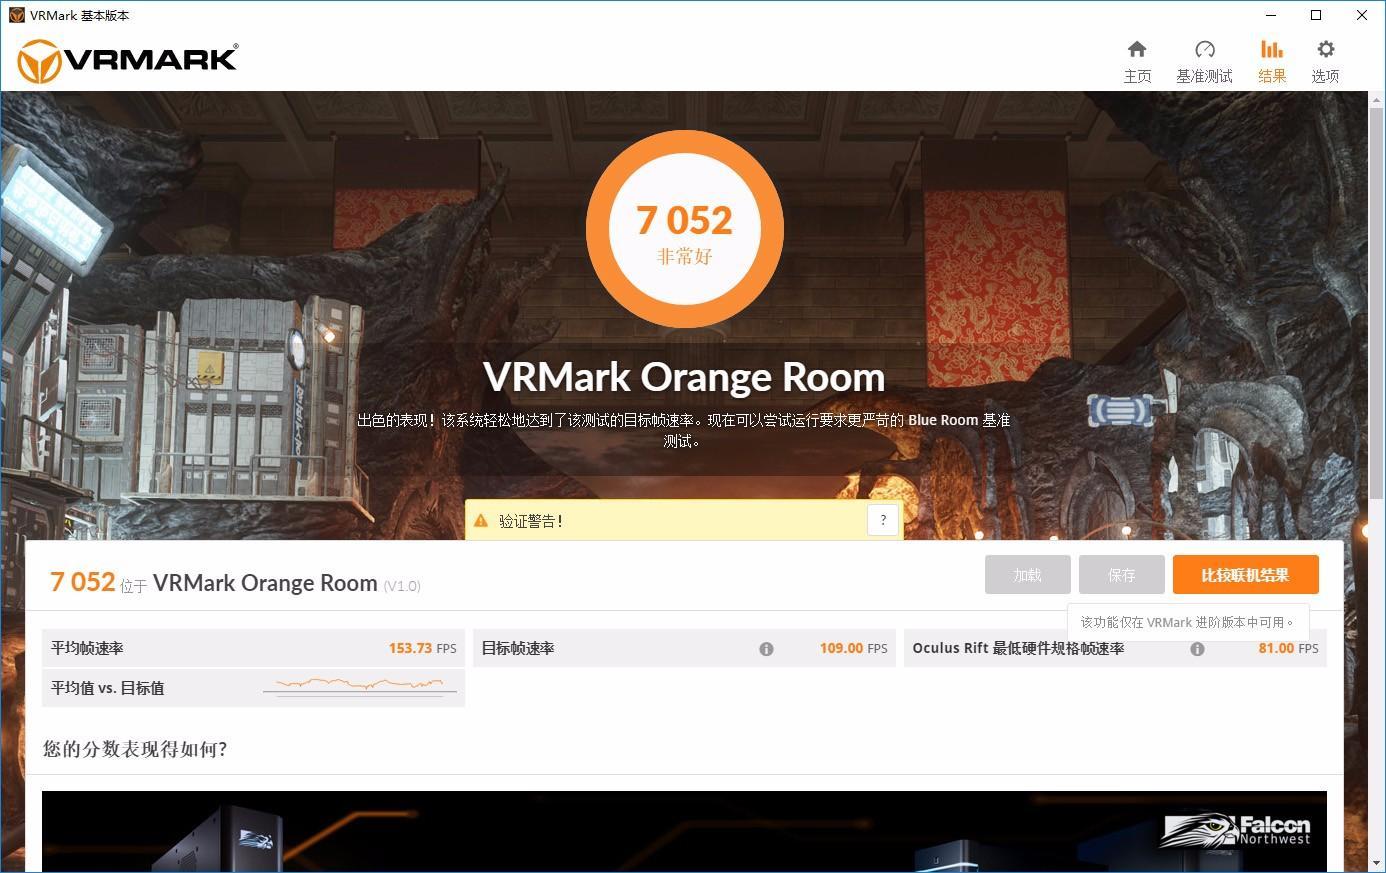 intel-core-i7-7700k_vrmark-vantage-room